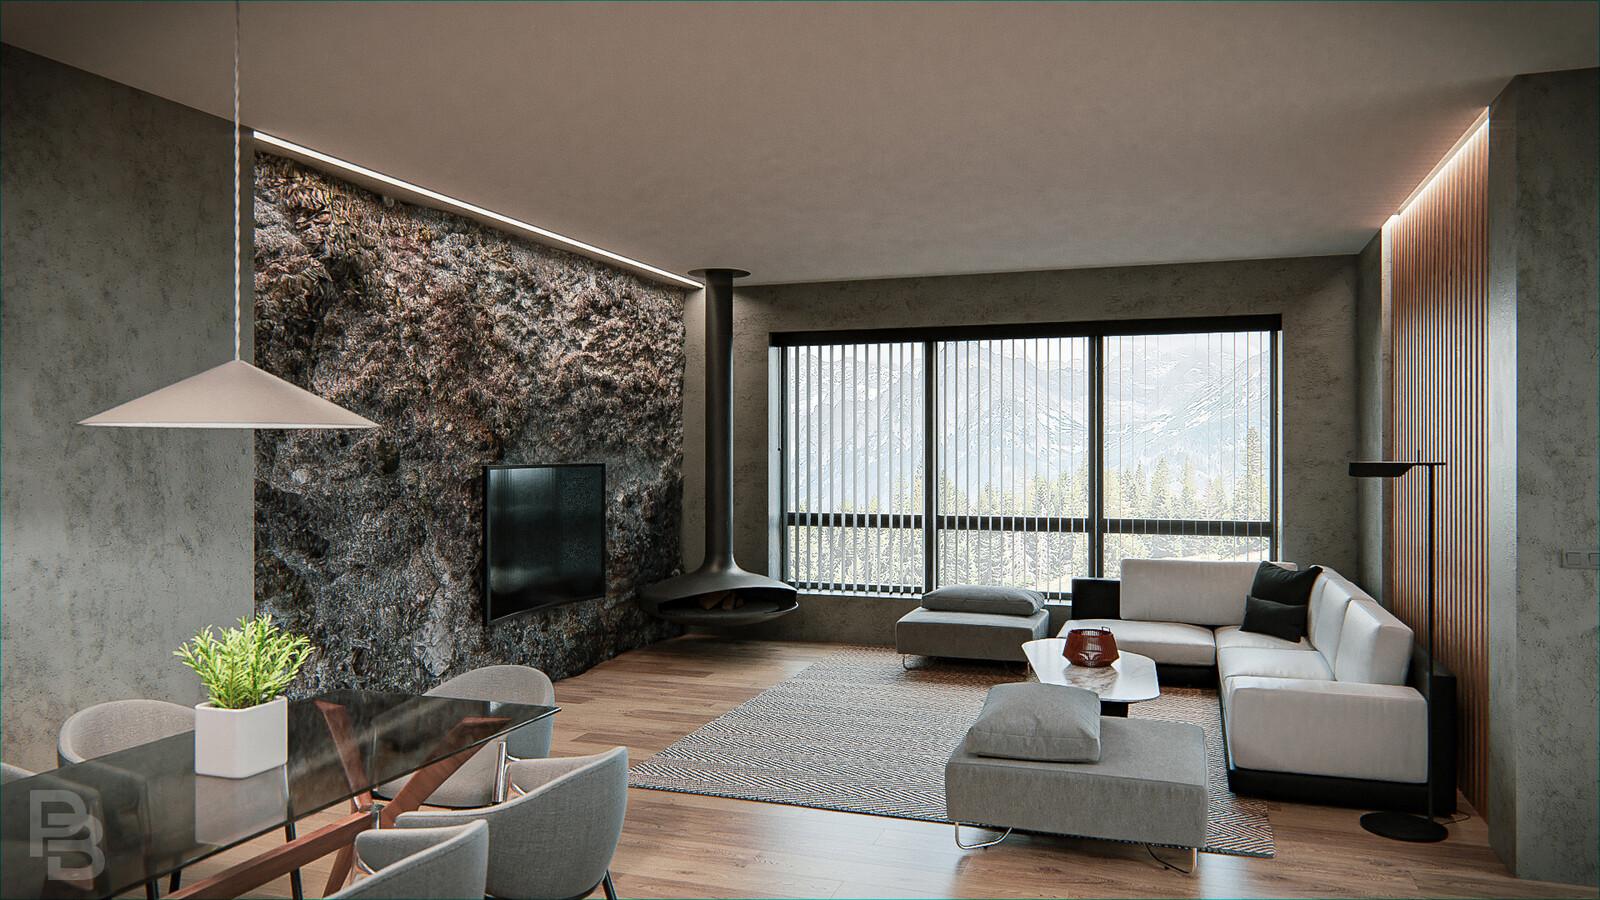 Rock livingroom